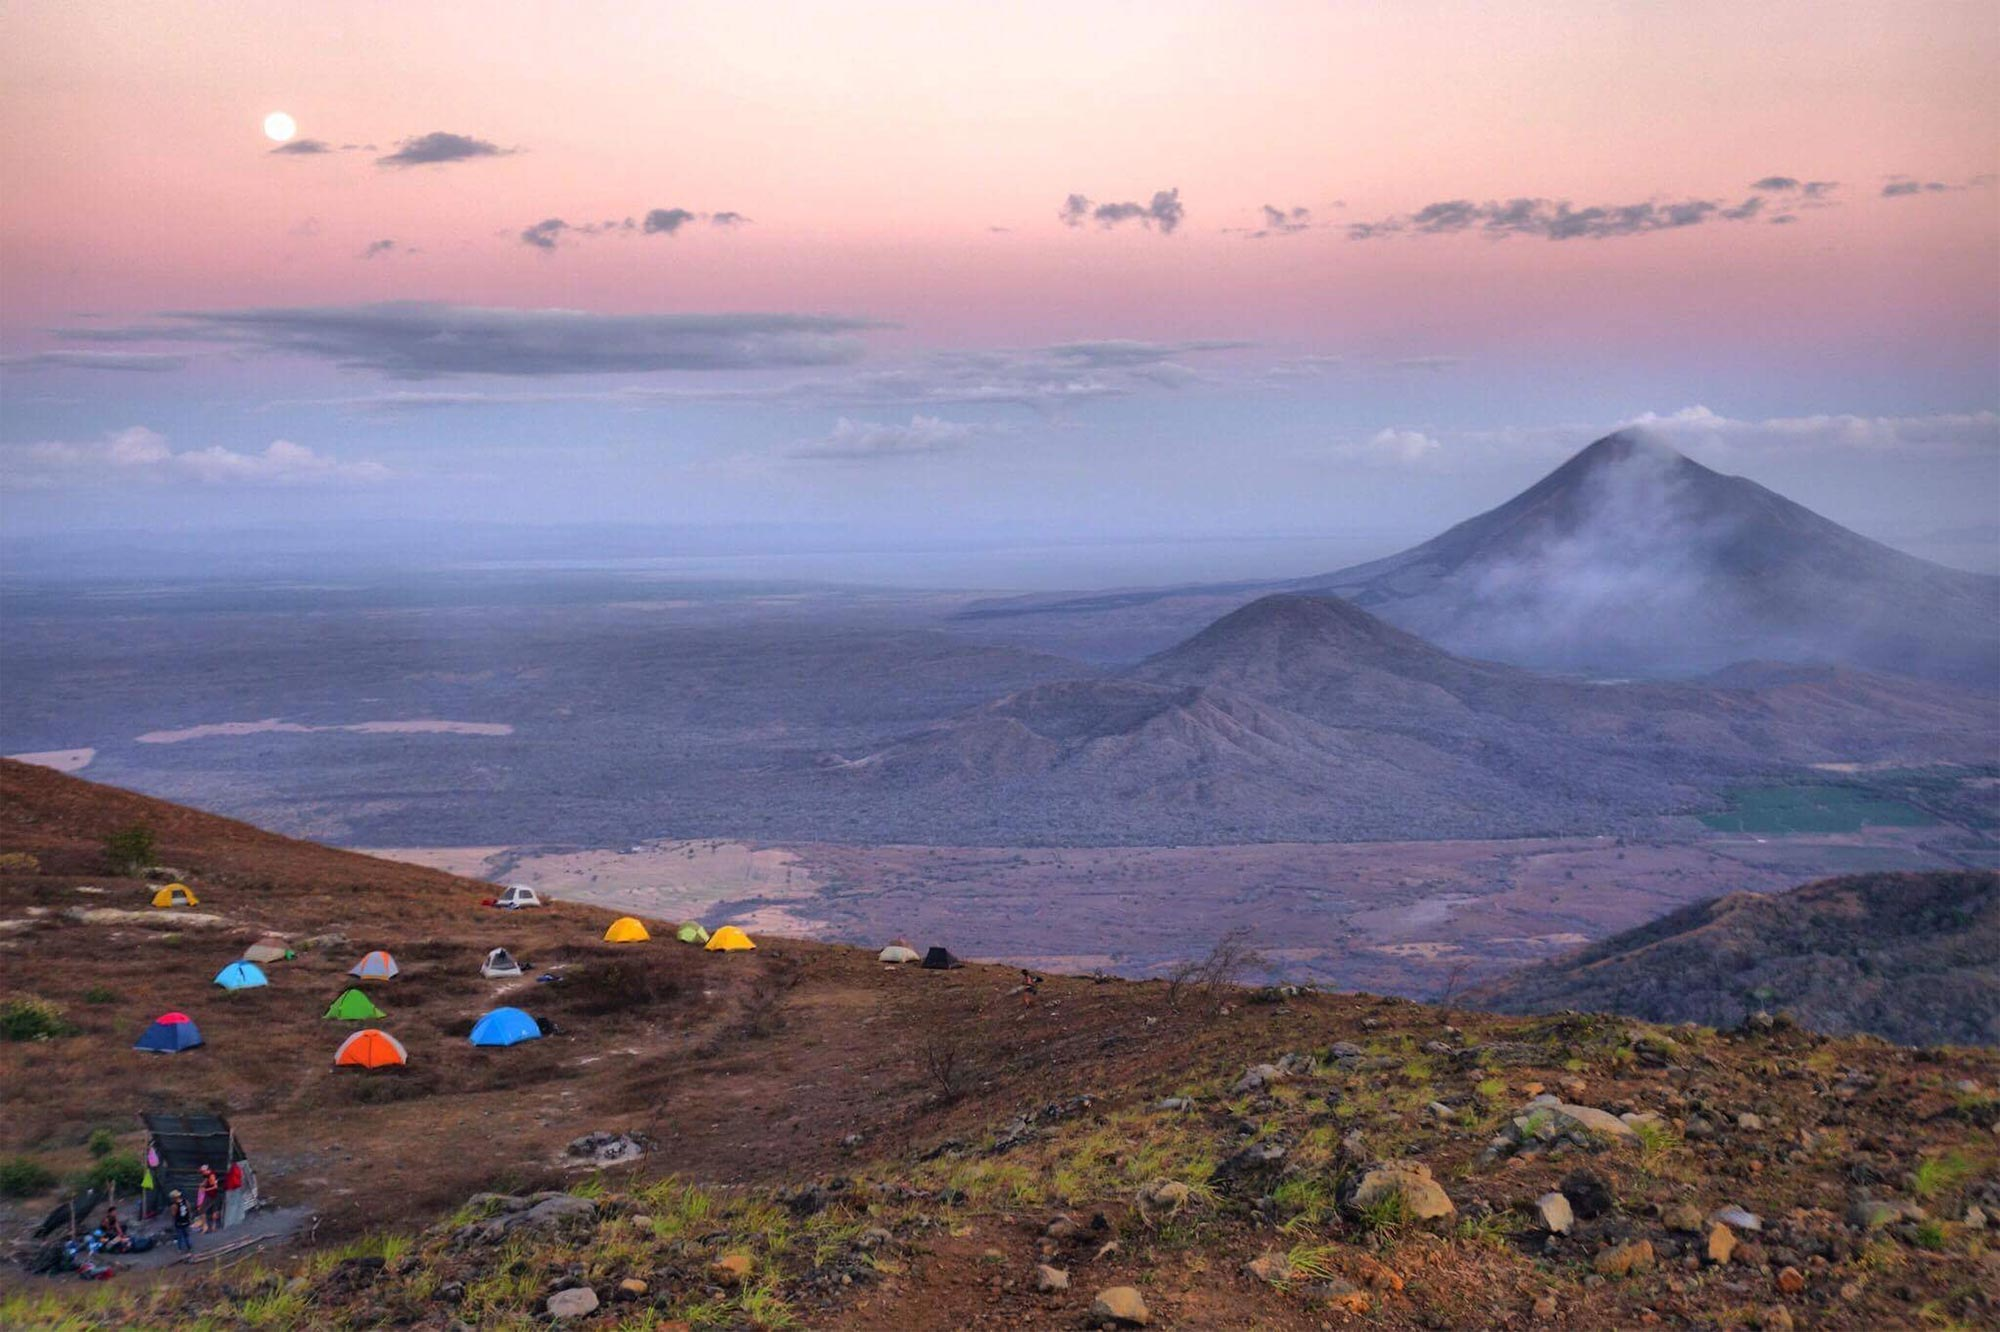 moon rise while hiking El Hoyo volcano in Nicaragua